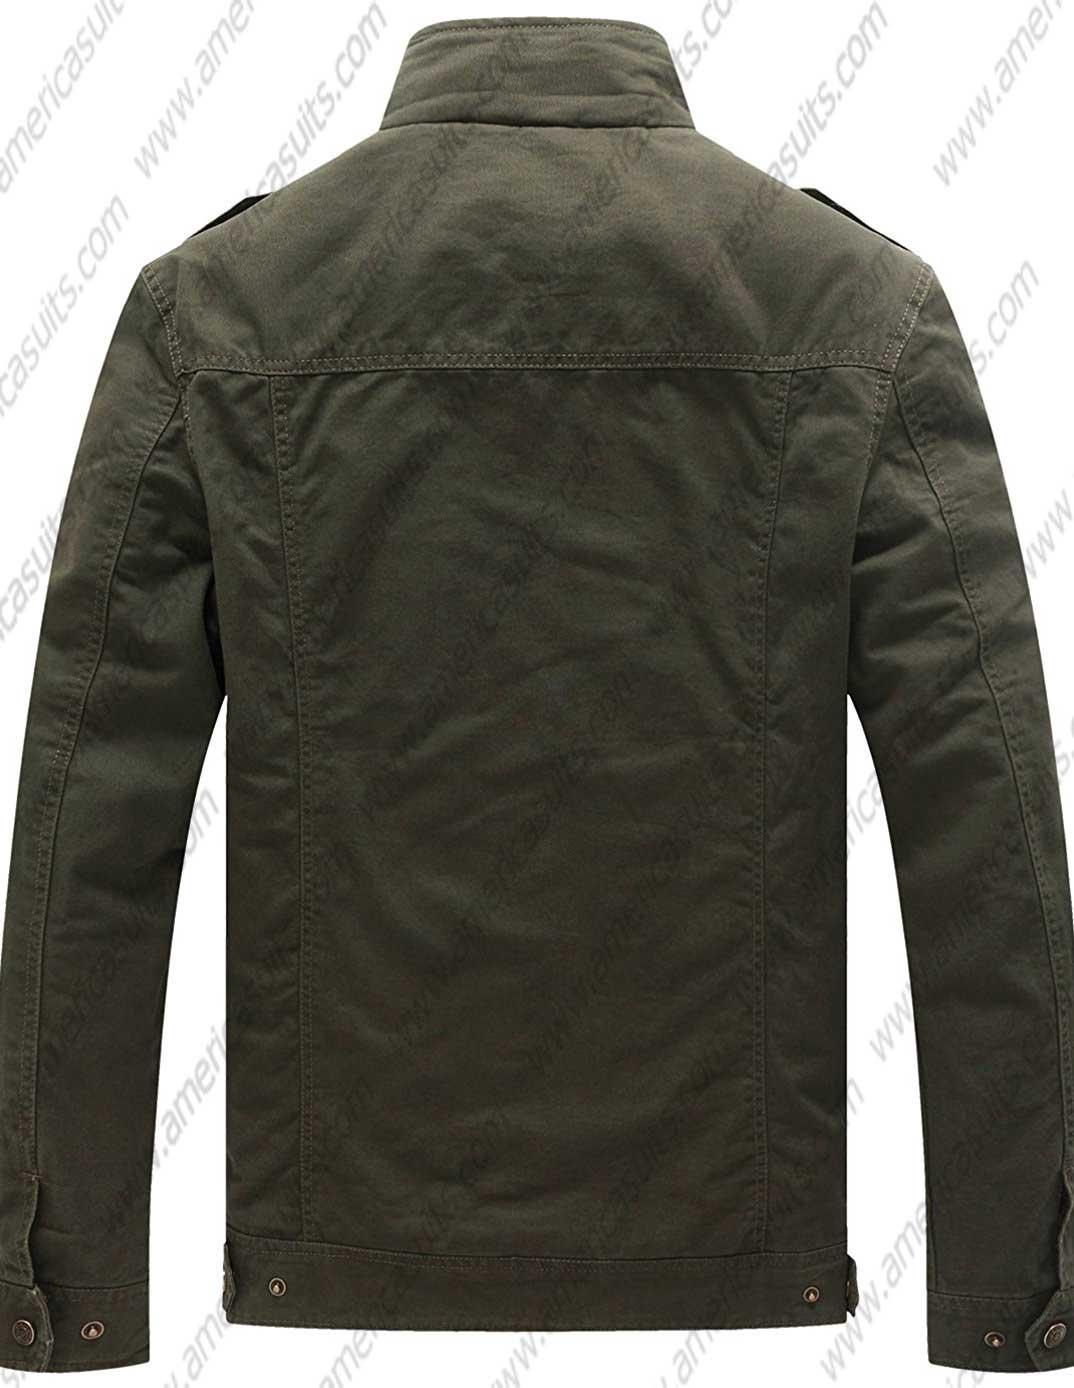 men-fashion-military-jacket